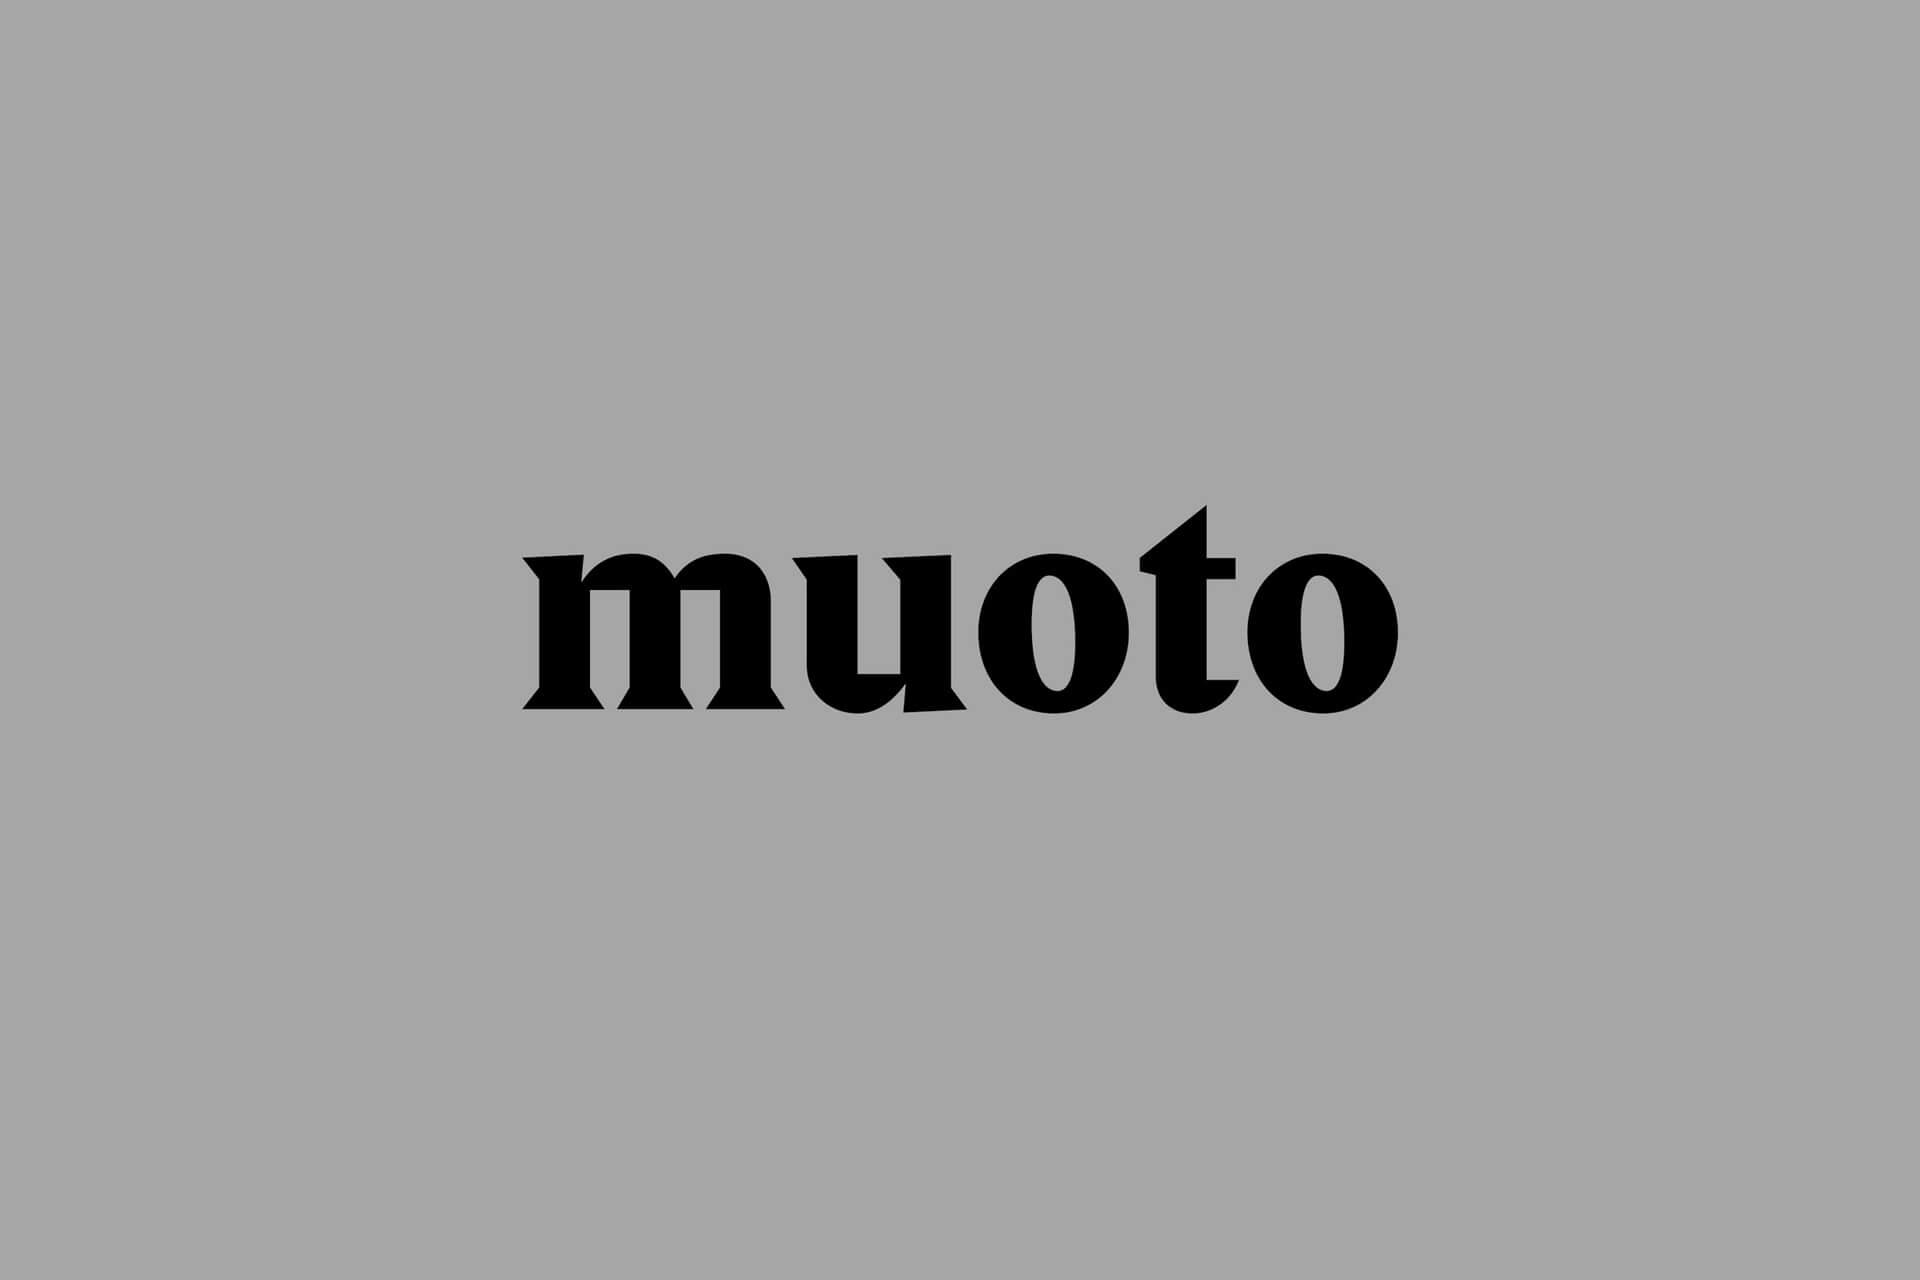 muoto-logo-plastac-01